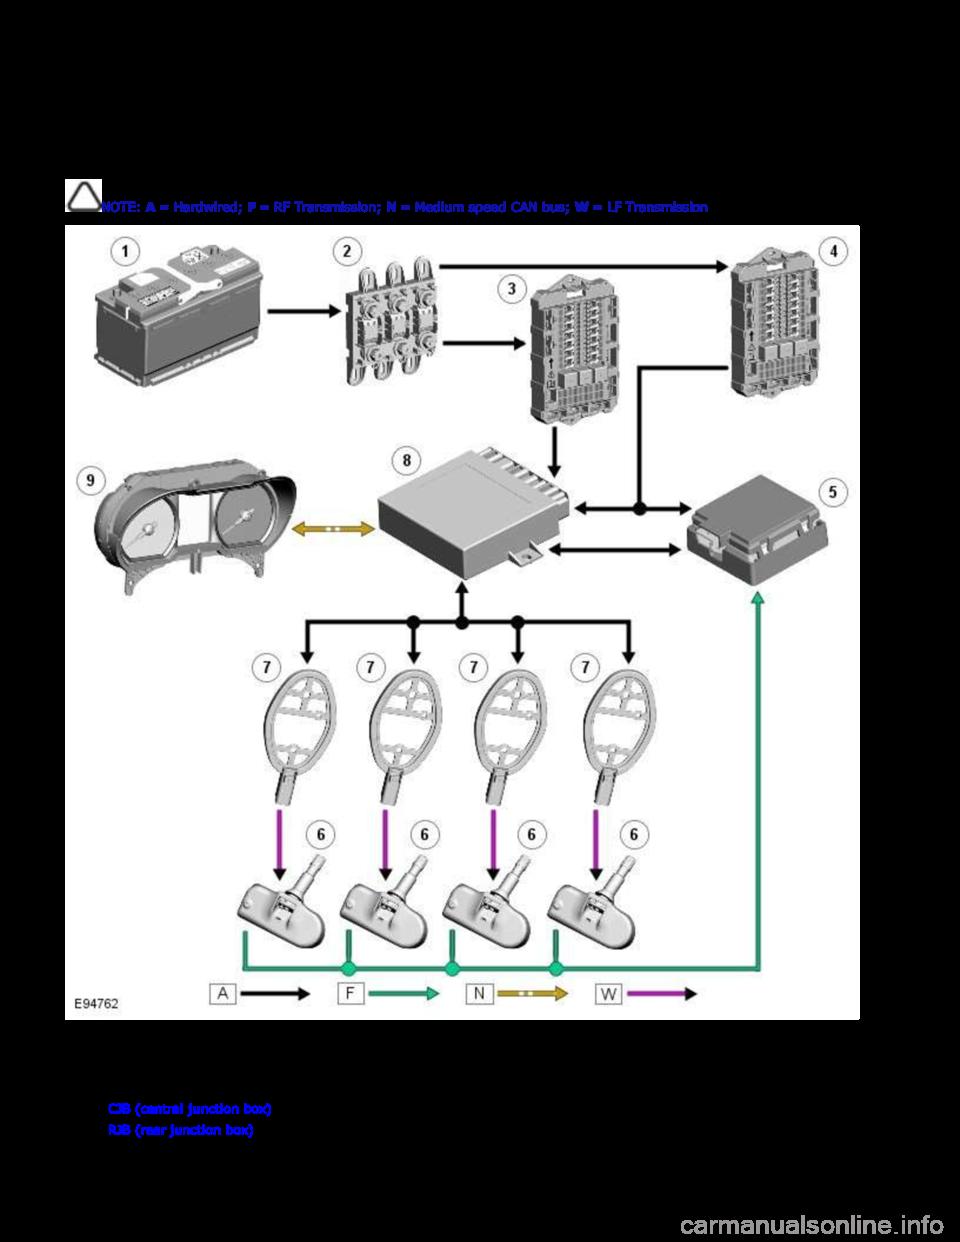 Tire Pressure Jaguar Xfr 2010 1g Workshop Manual Xf Wiring Diagram Page 442